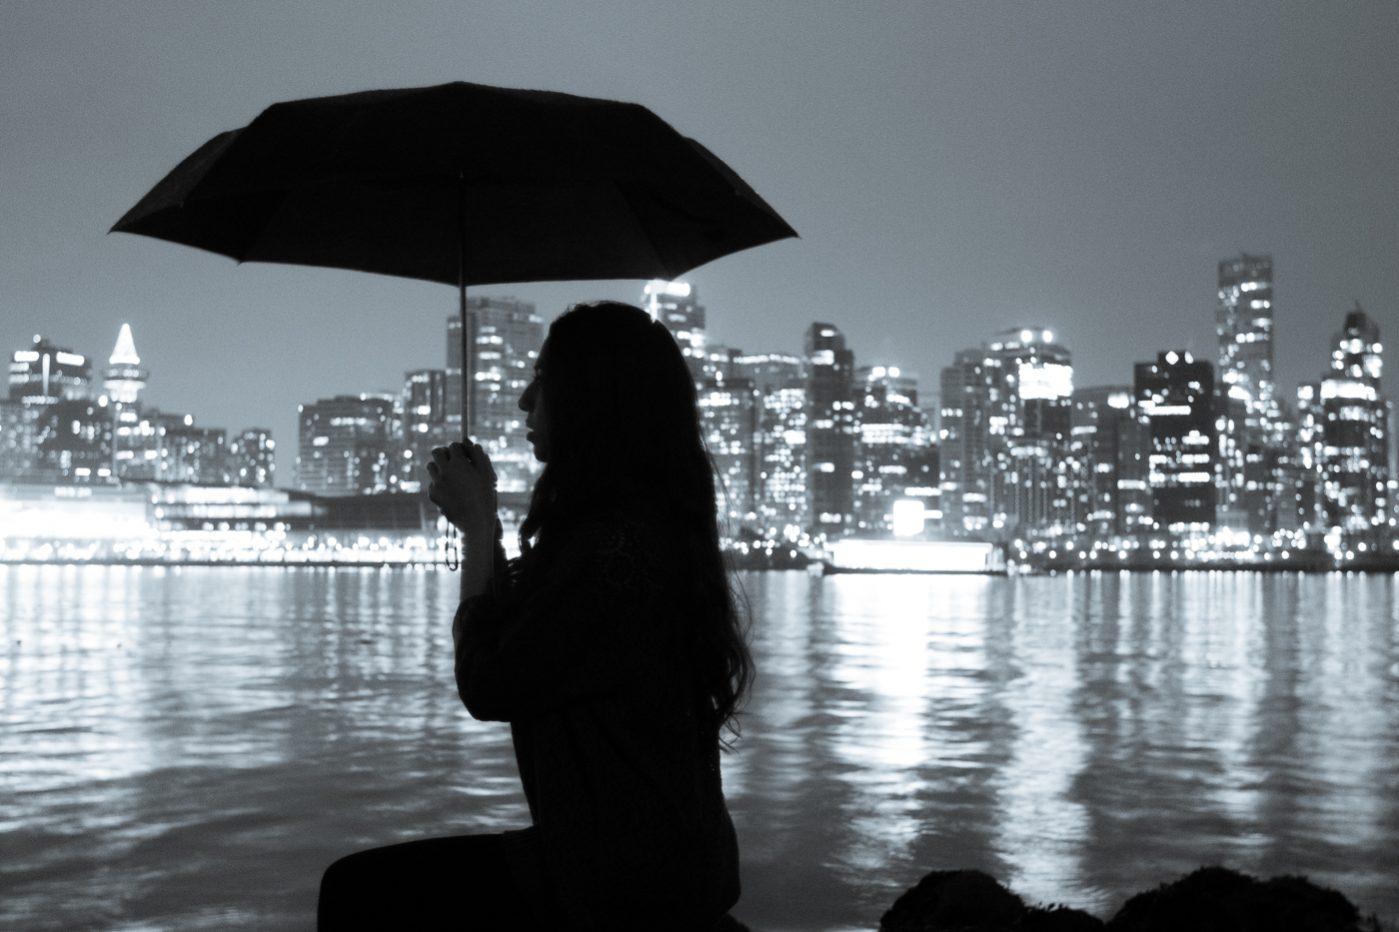 Girl holding umbrella. Silhouette in Stanley Park, overlooking Vancouver skyline.